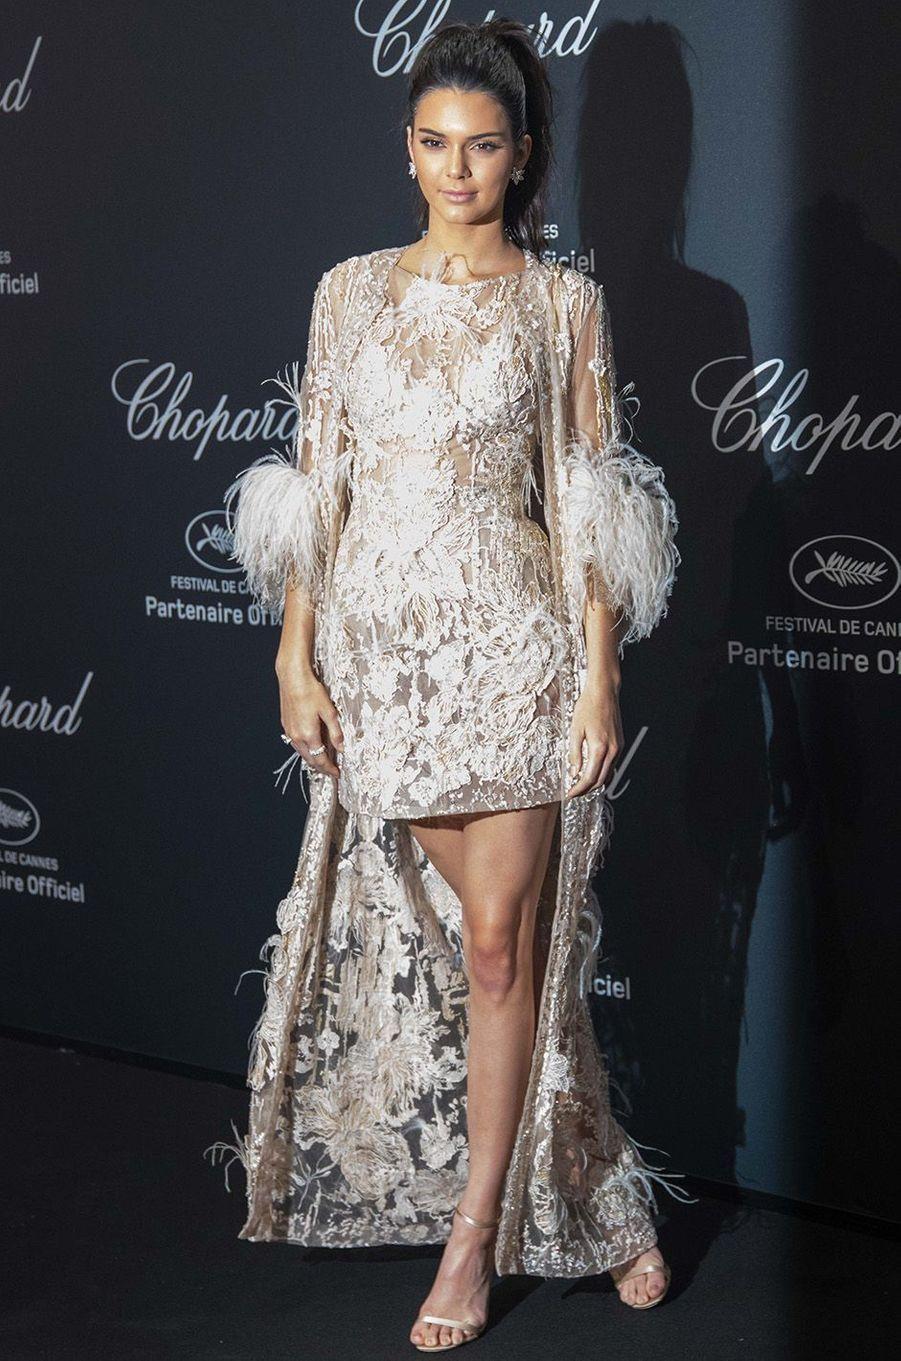 Kendall Jenner au gala Chopard, à Cannes, le 16 mai 2016.